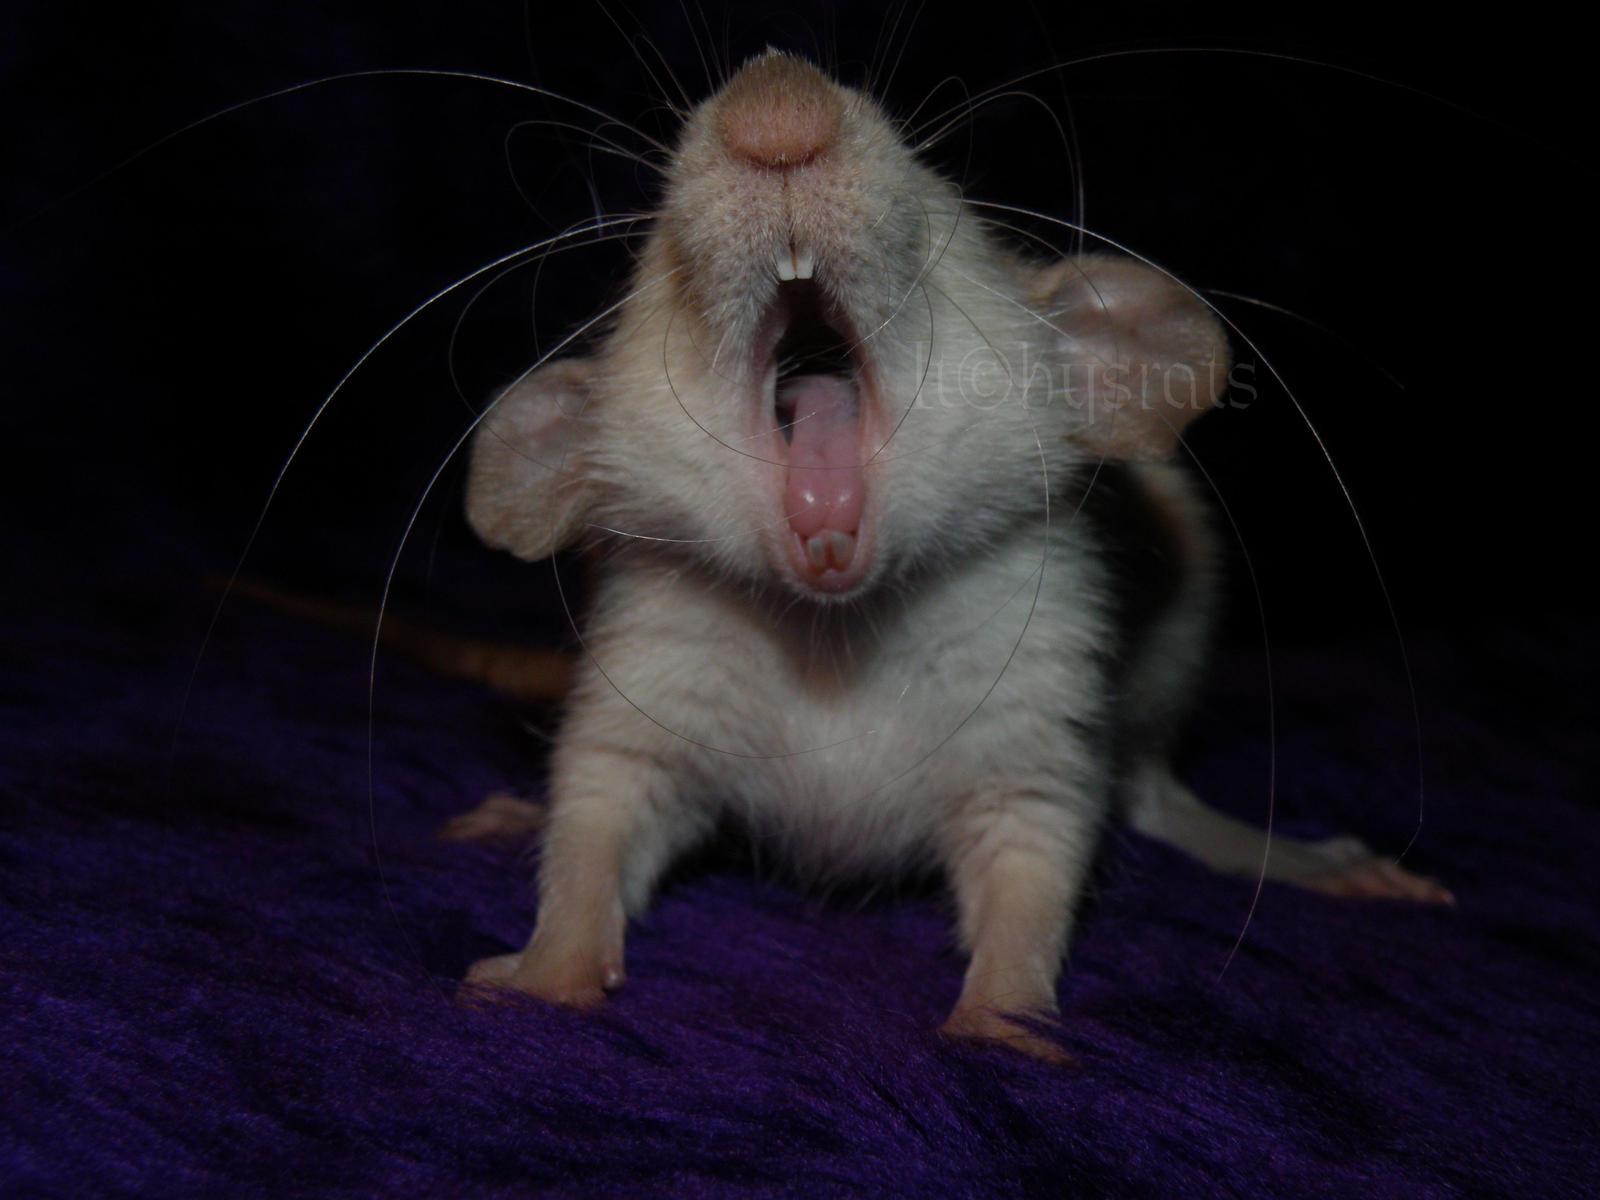 cute rat wallpaper art - photo #15